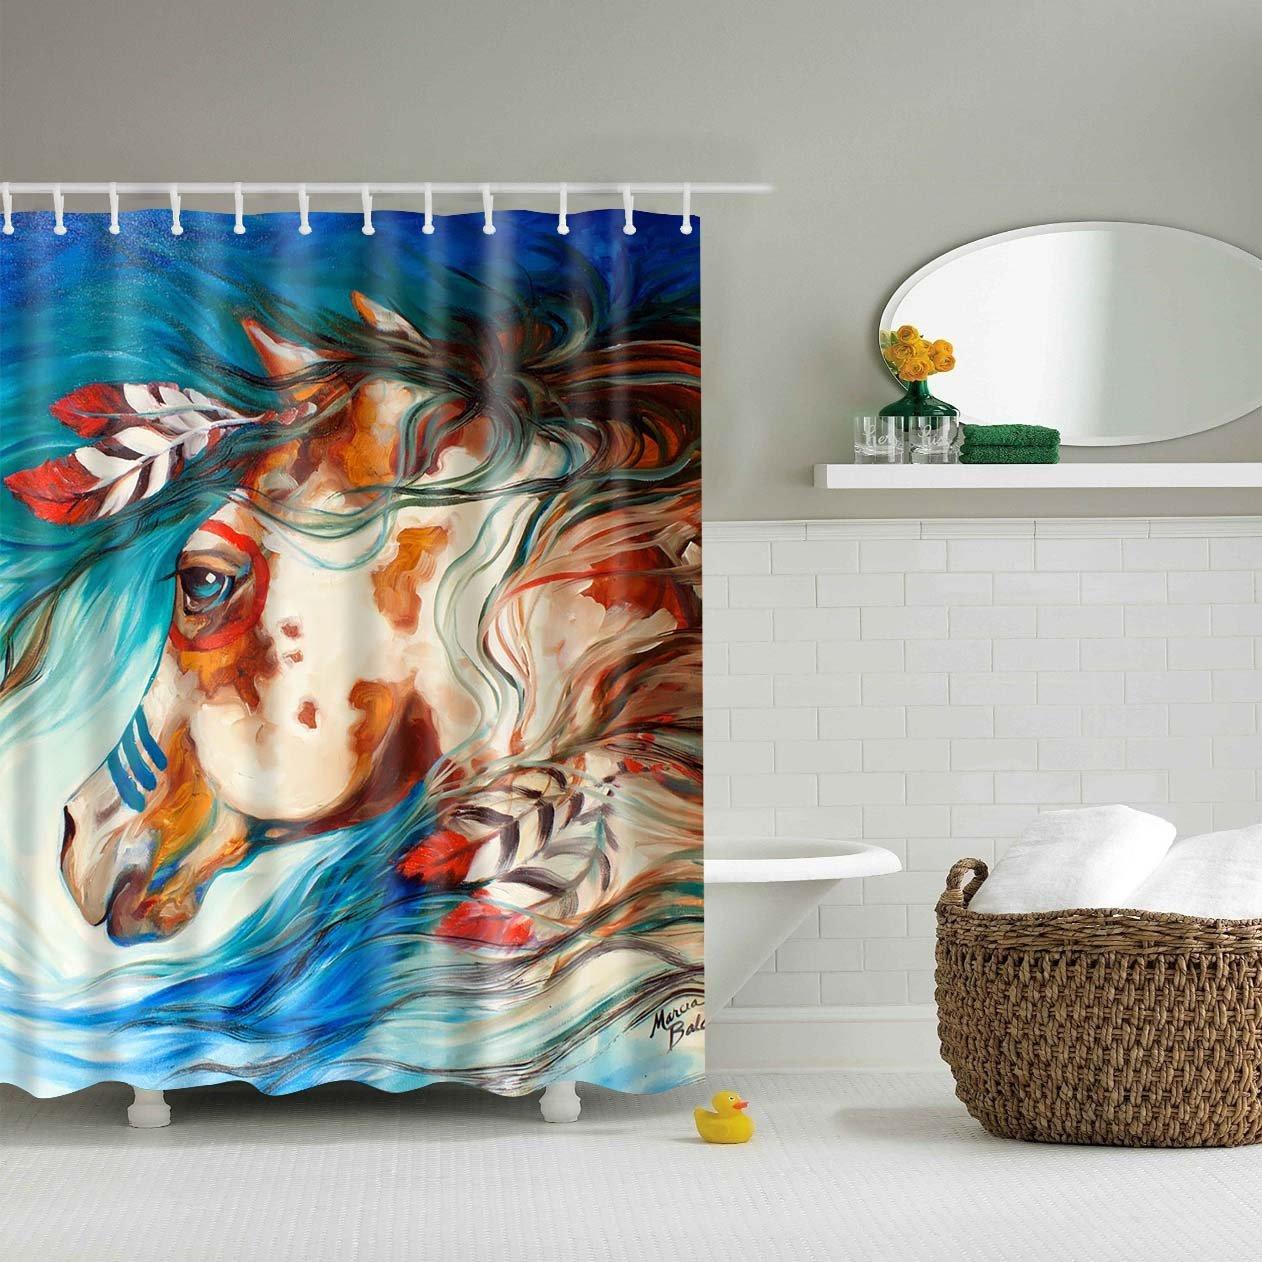 Native American Indians Horses Art Shower Curtain Bathroom Decor